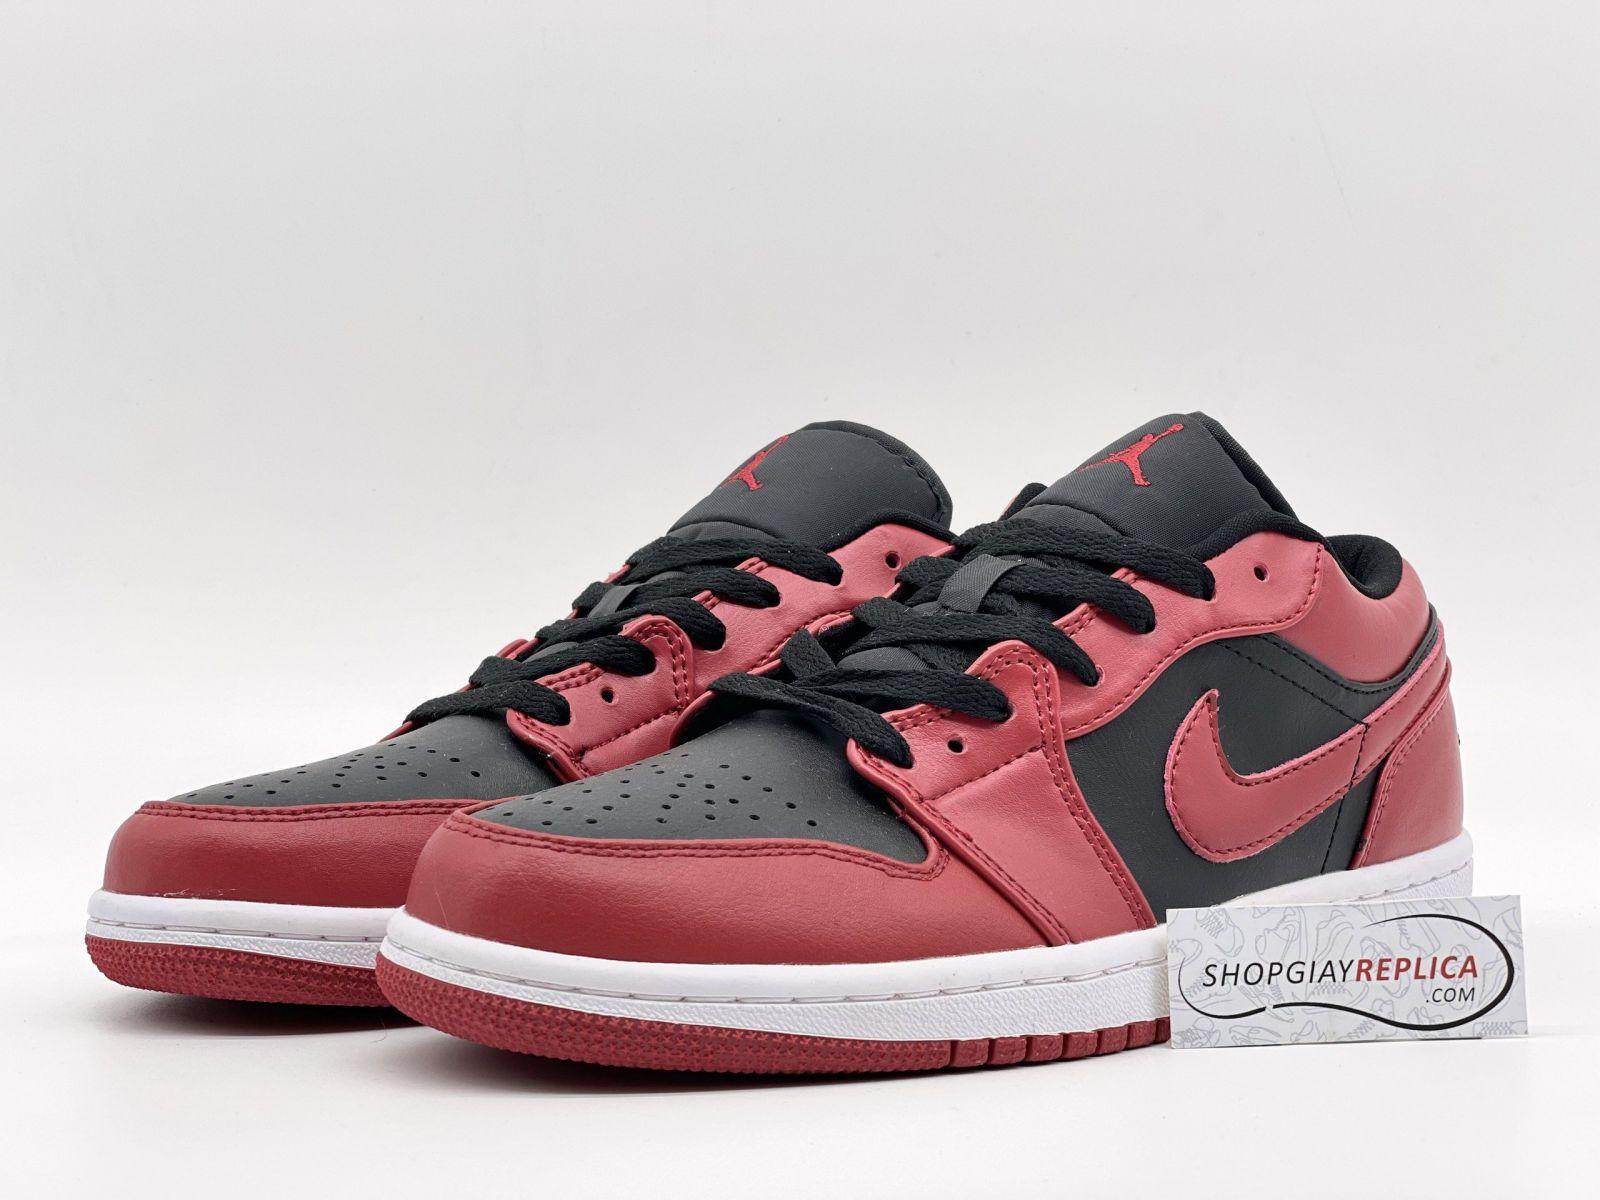 giày Nike Jordan 1 Low Reverse Bred Replica 1:1